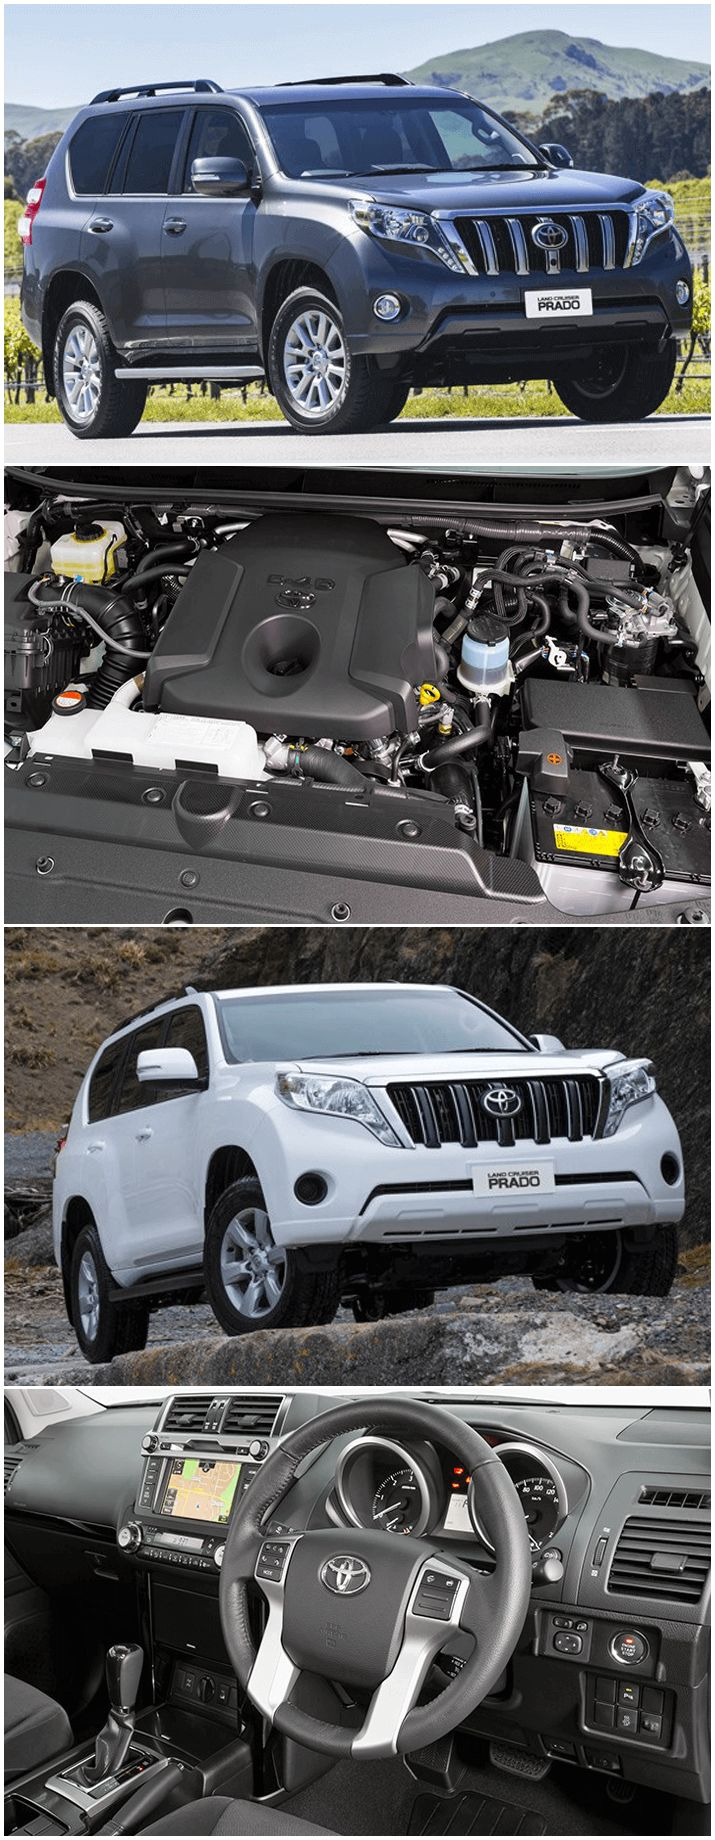 Toyota prado offers both petrol and diesel engines